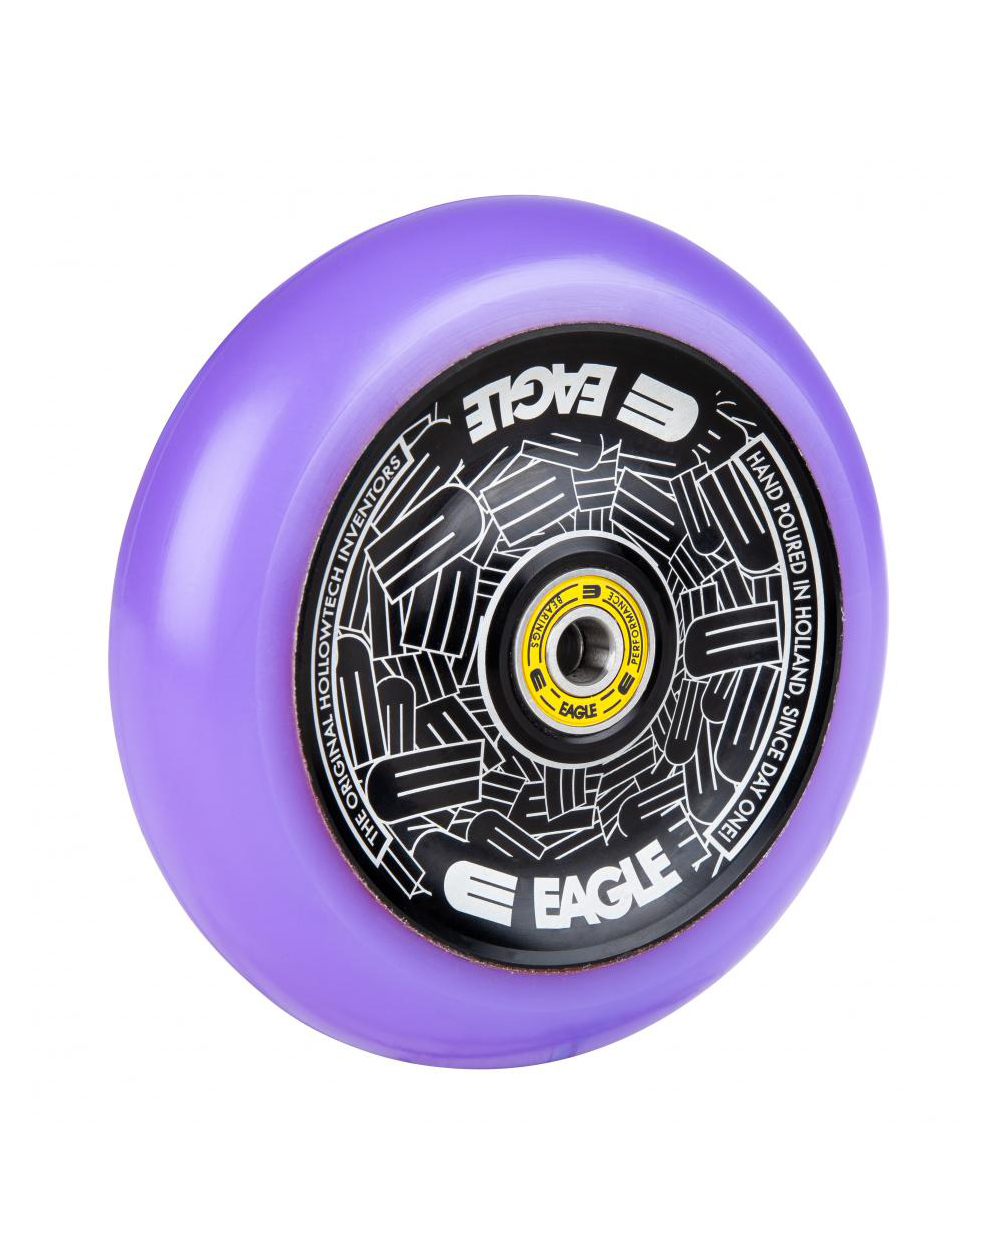 Eagle Supply Radix Eagle Hollowtech Full Core Scooter Wheel Black/Purple